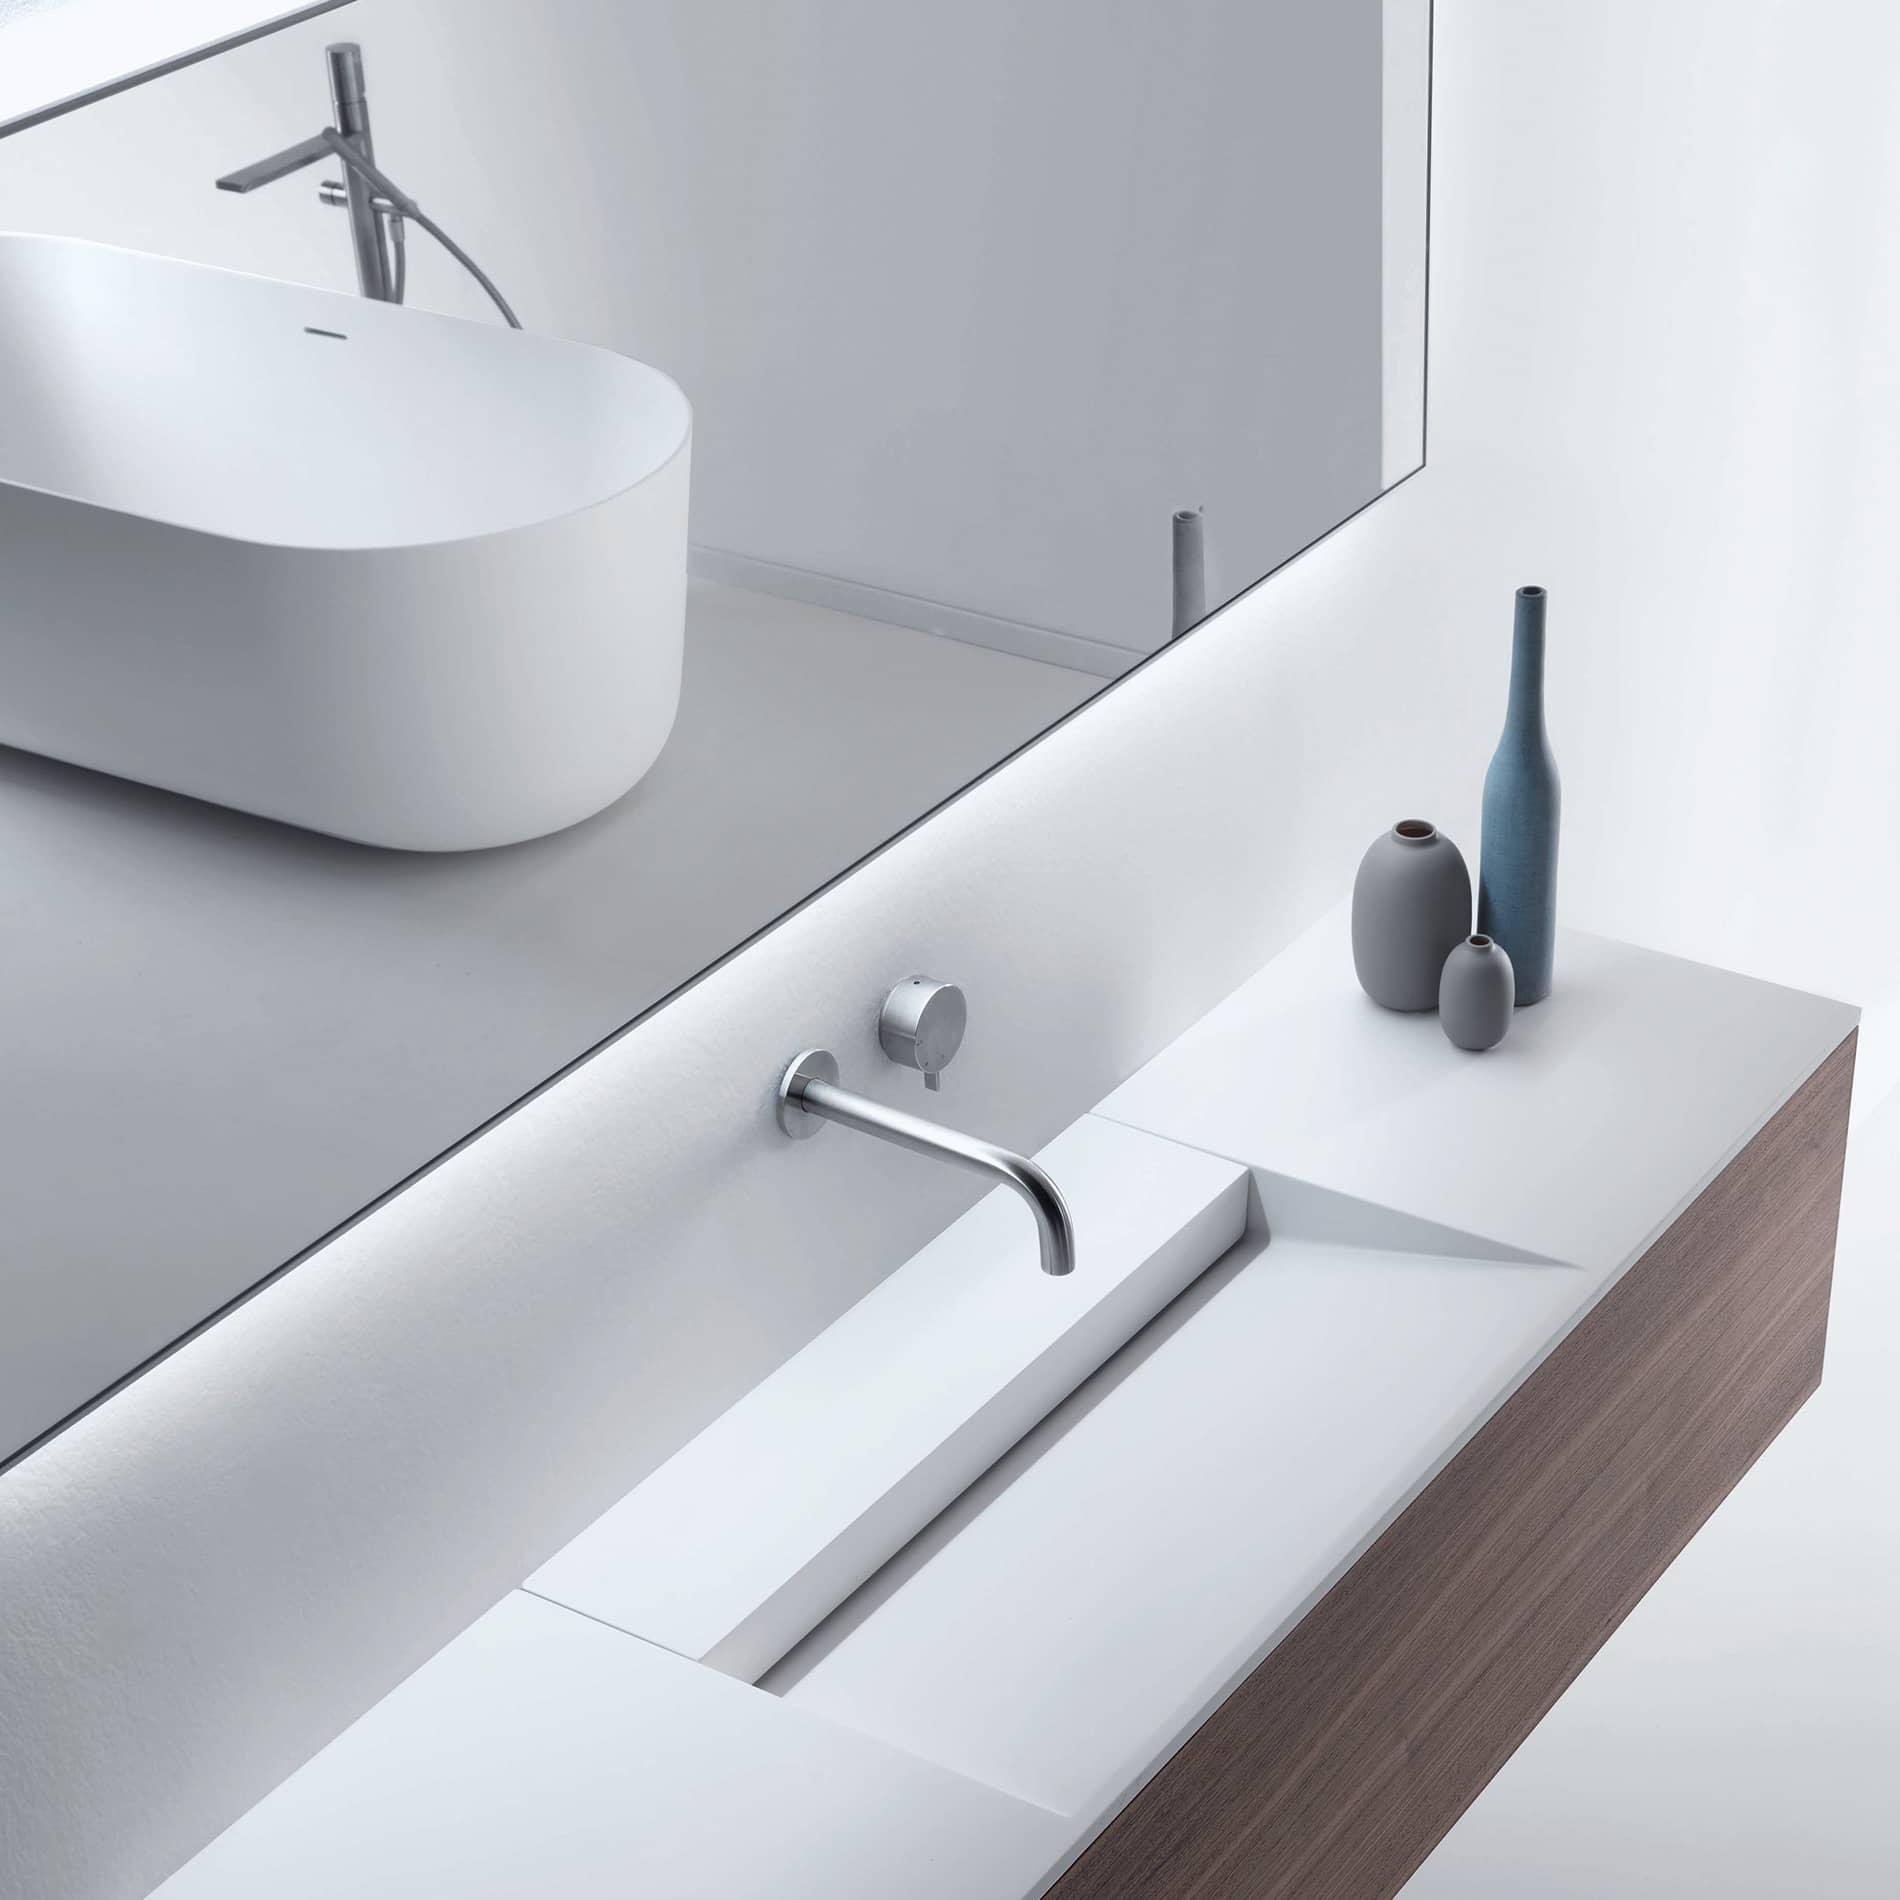 Cristalplant-products-Falper-washbasins-3